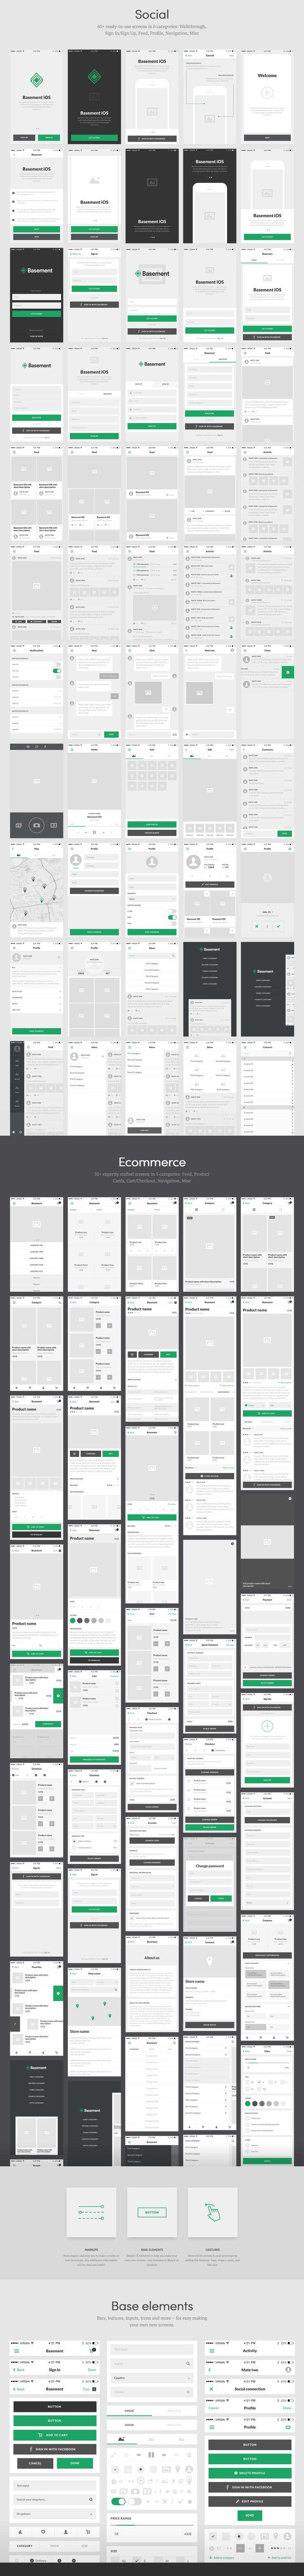 UI Kit from Basement iOS